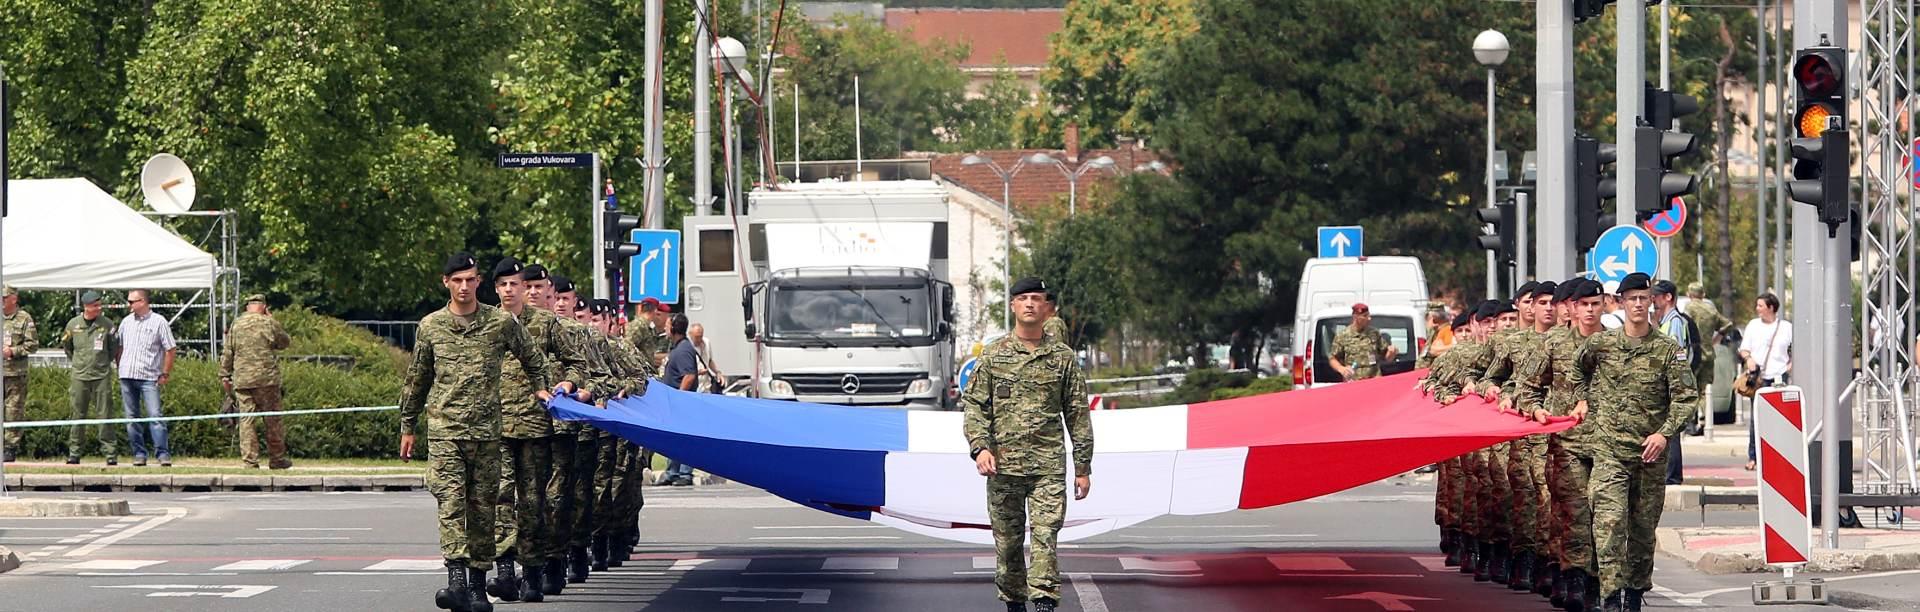 VIDEO/ FOTO: PRIPREME PRI KRAJU Održana generalna proba za svečani mimohod u Zagrebu